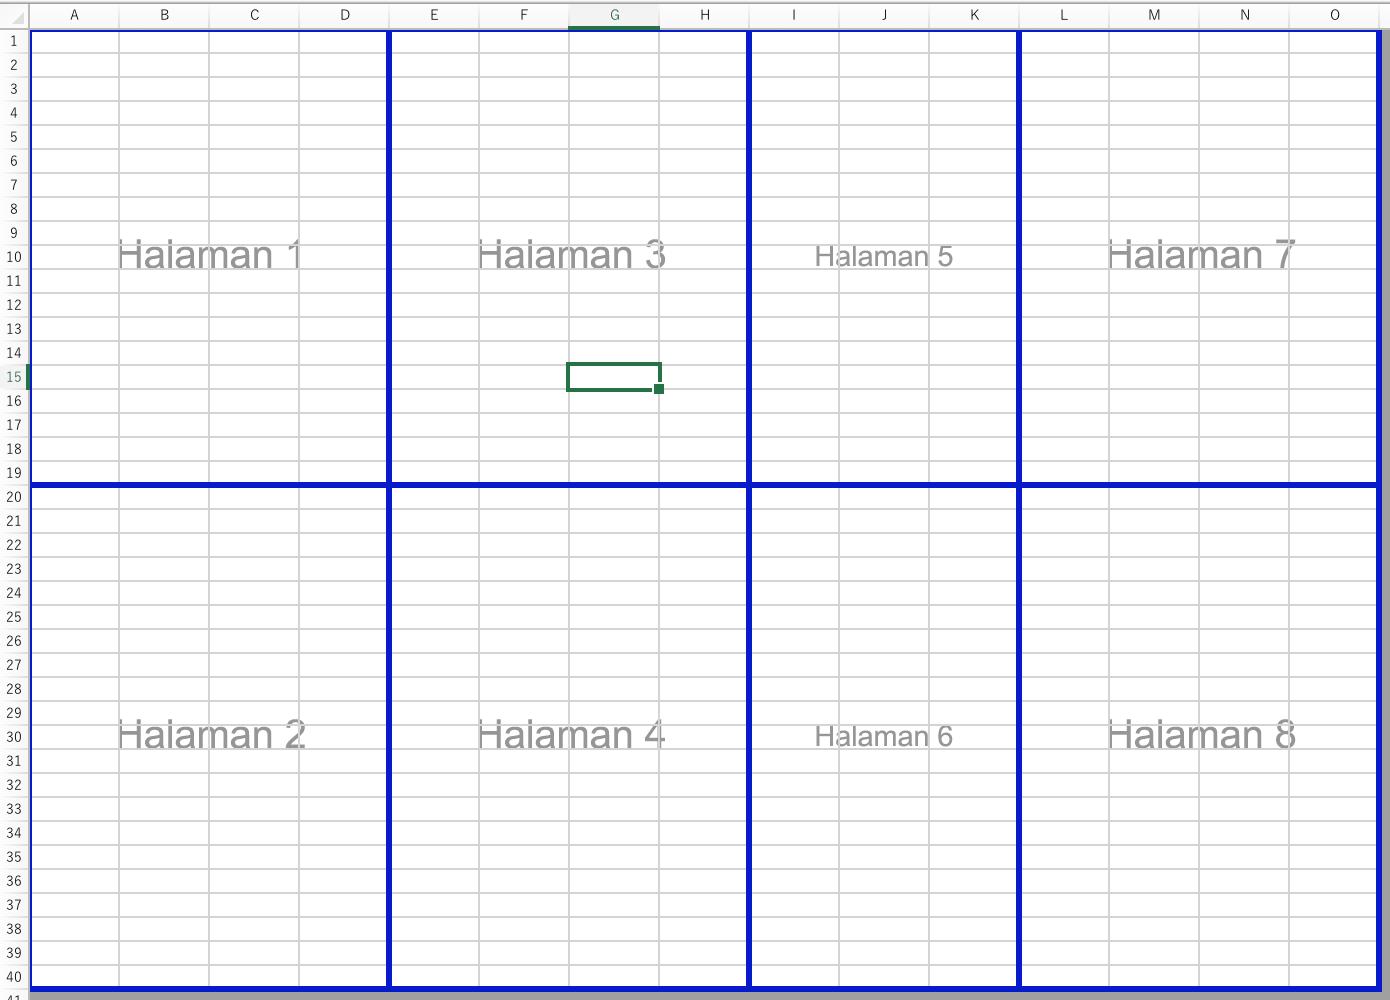 Membuat Hentian Halaman Manual Di Lembar Kerja Dengan